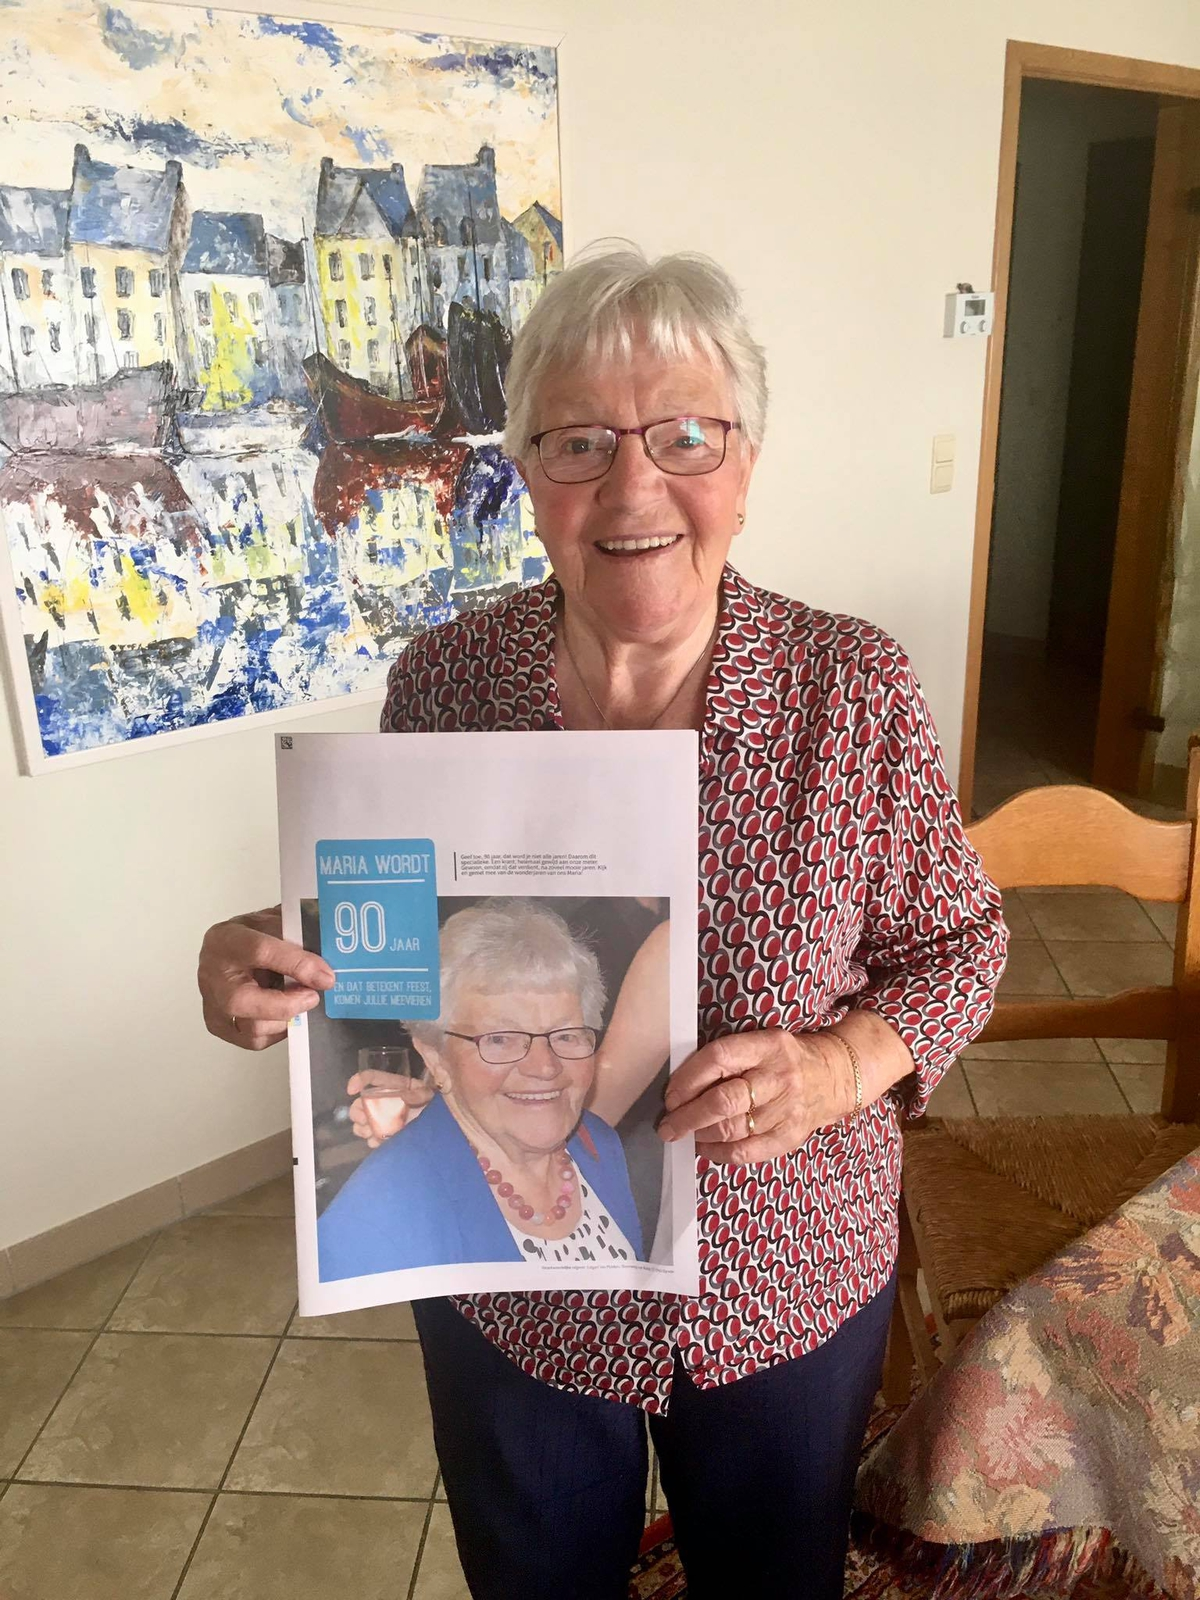 birthday party invitation as newspaper - Happiedays